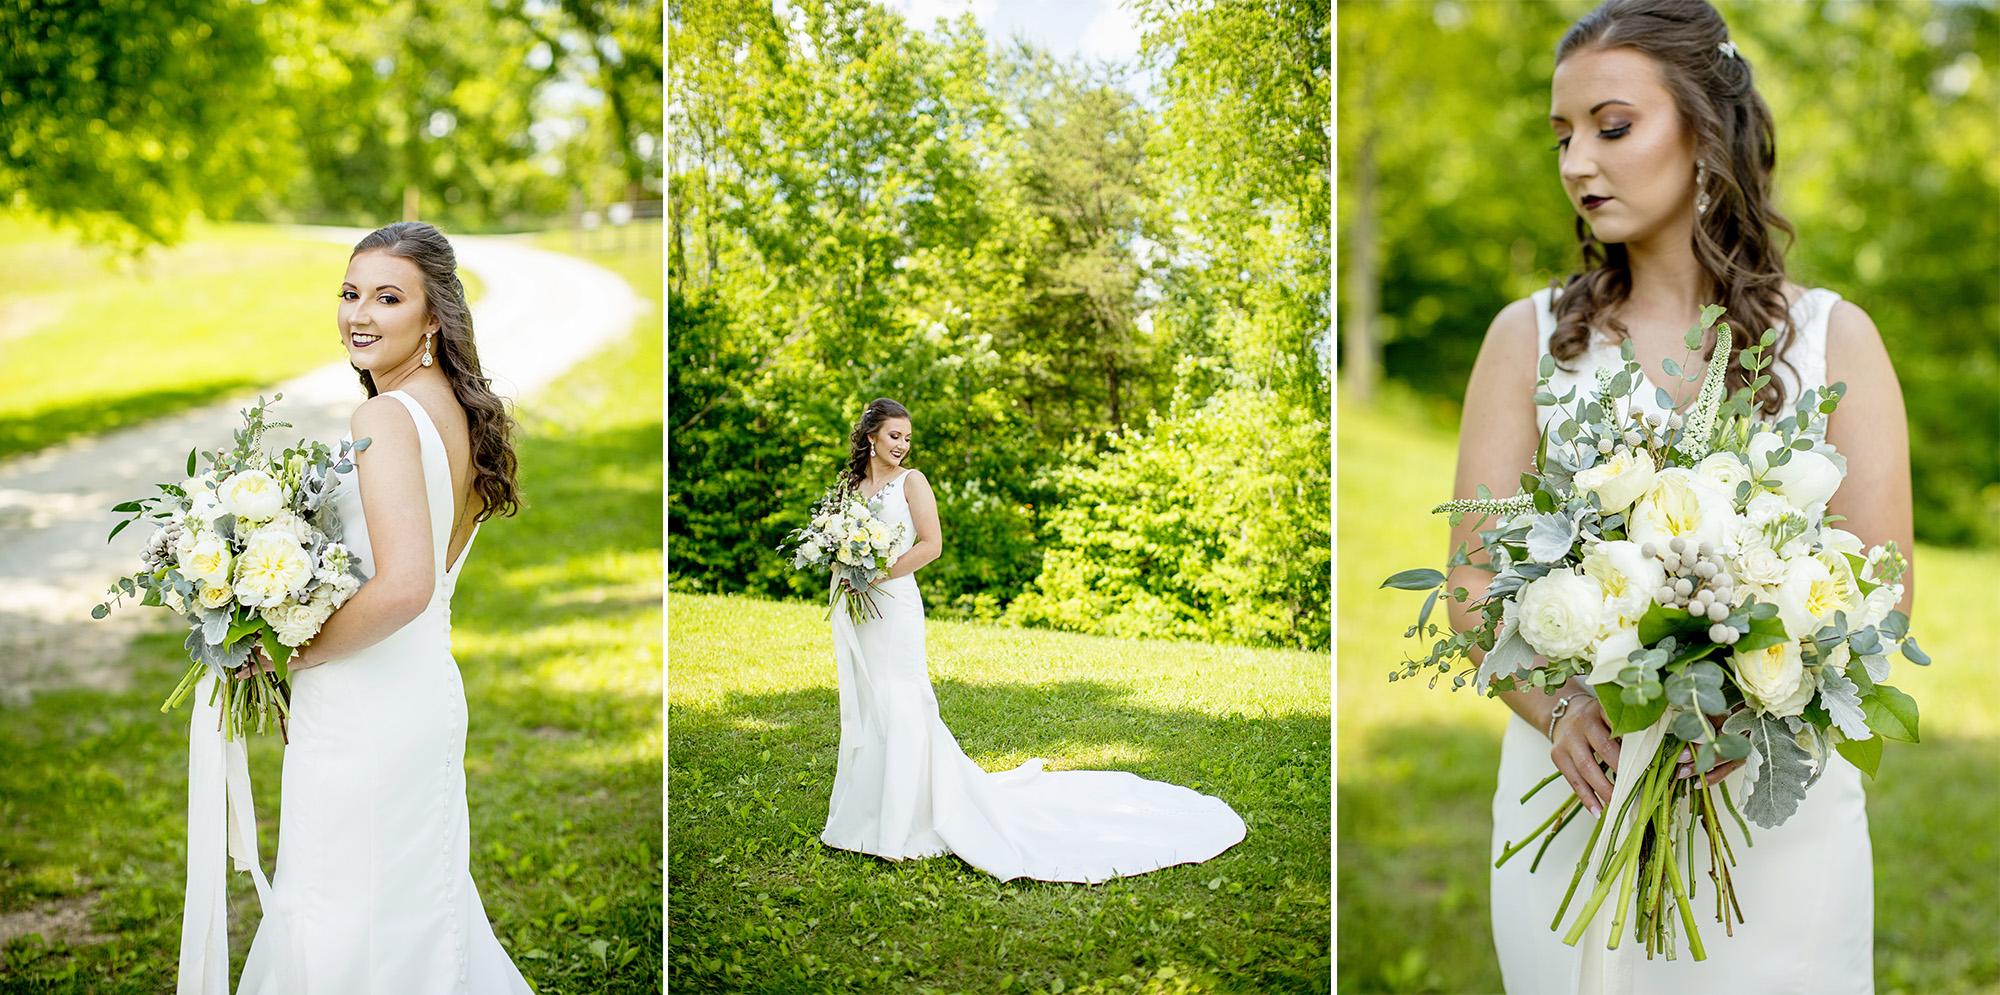 Seriously_Sabrina_Photography_Red_River_Gorge_Wedding_Barn_Robinson39.jpg